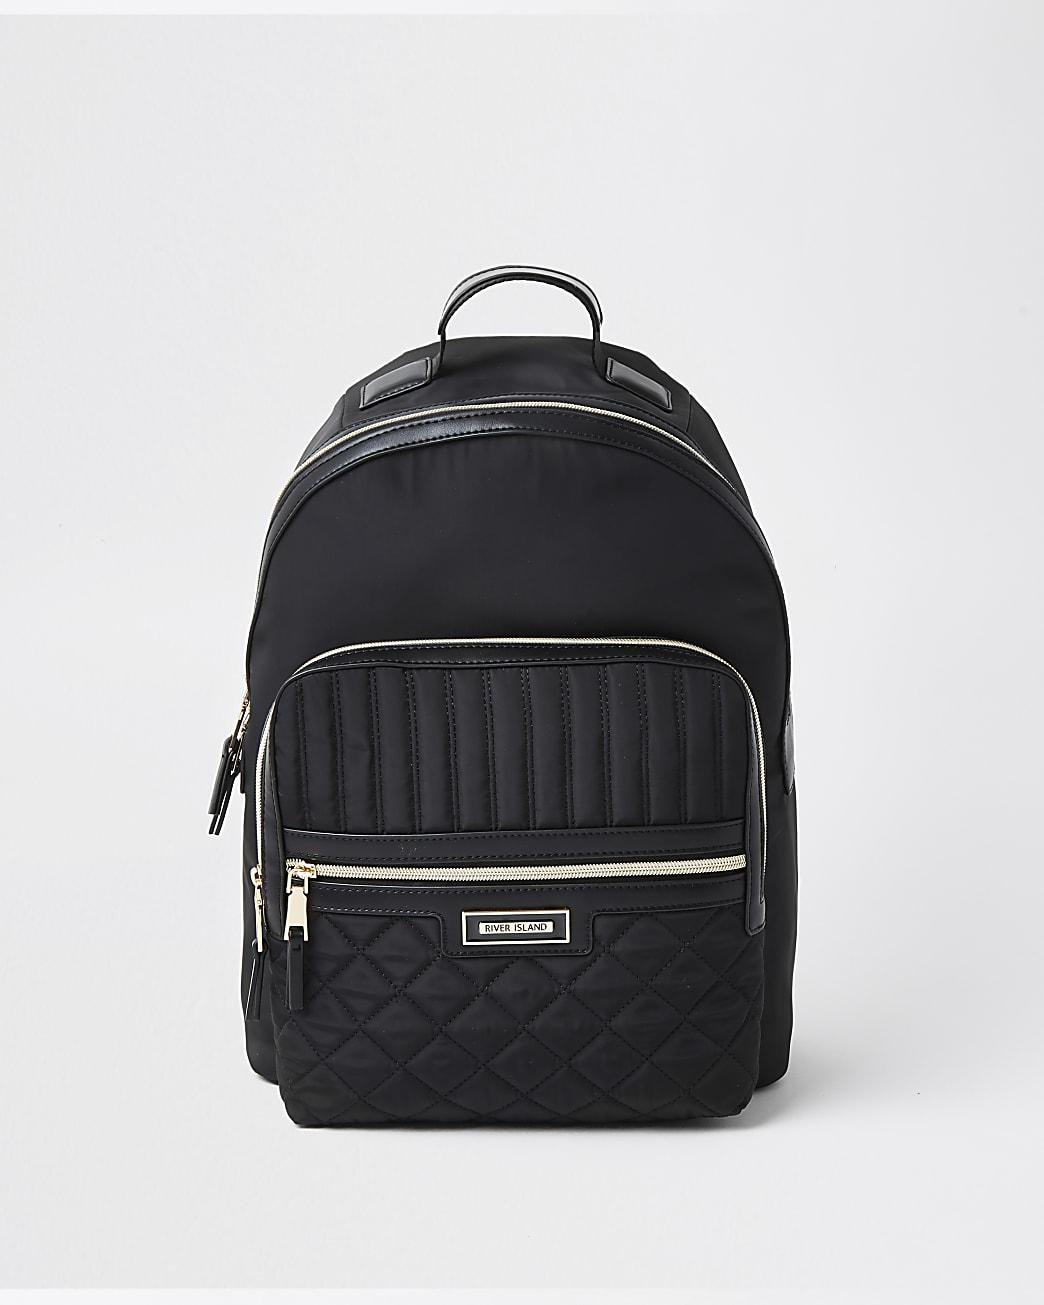 Black nylon RI backpack